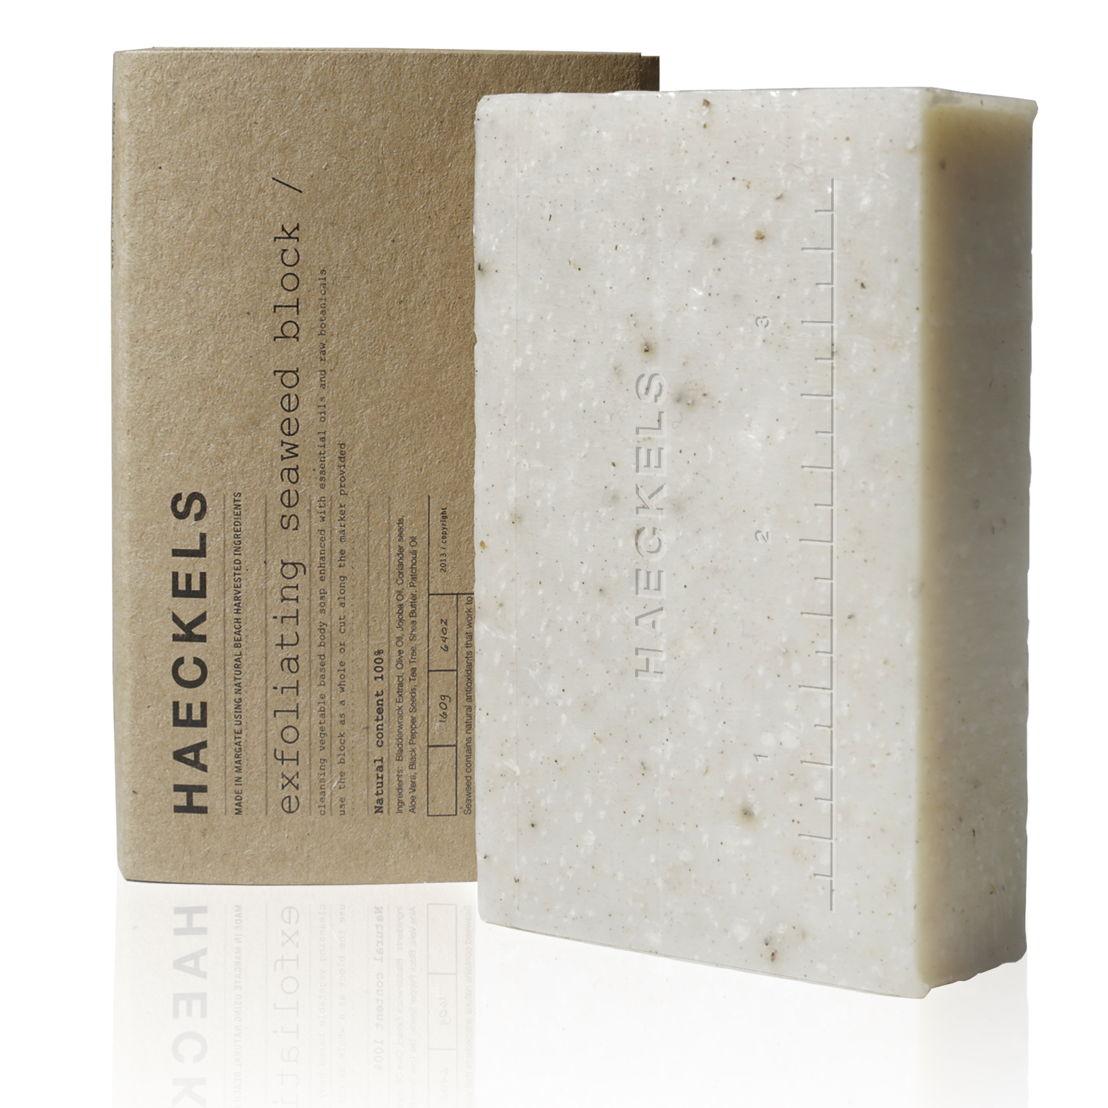 GR13 - Haeckels - Exfoliating soap - 12.50 euro